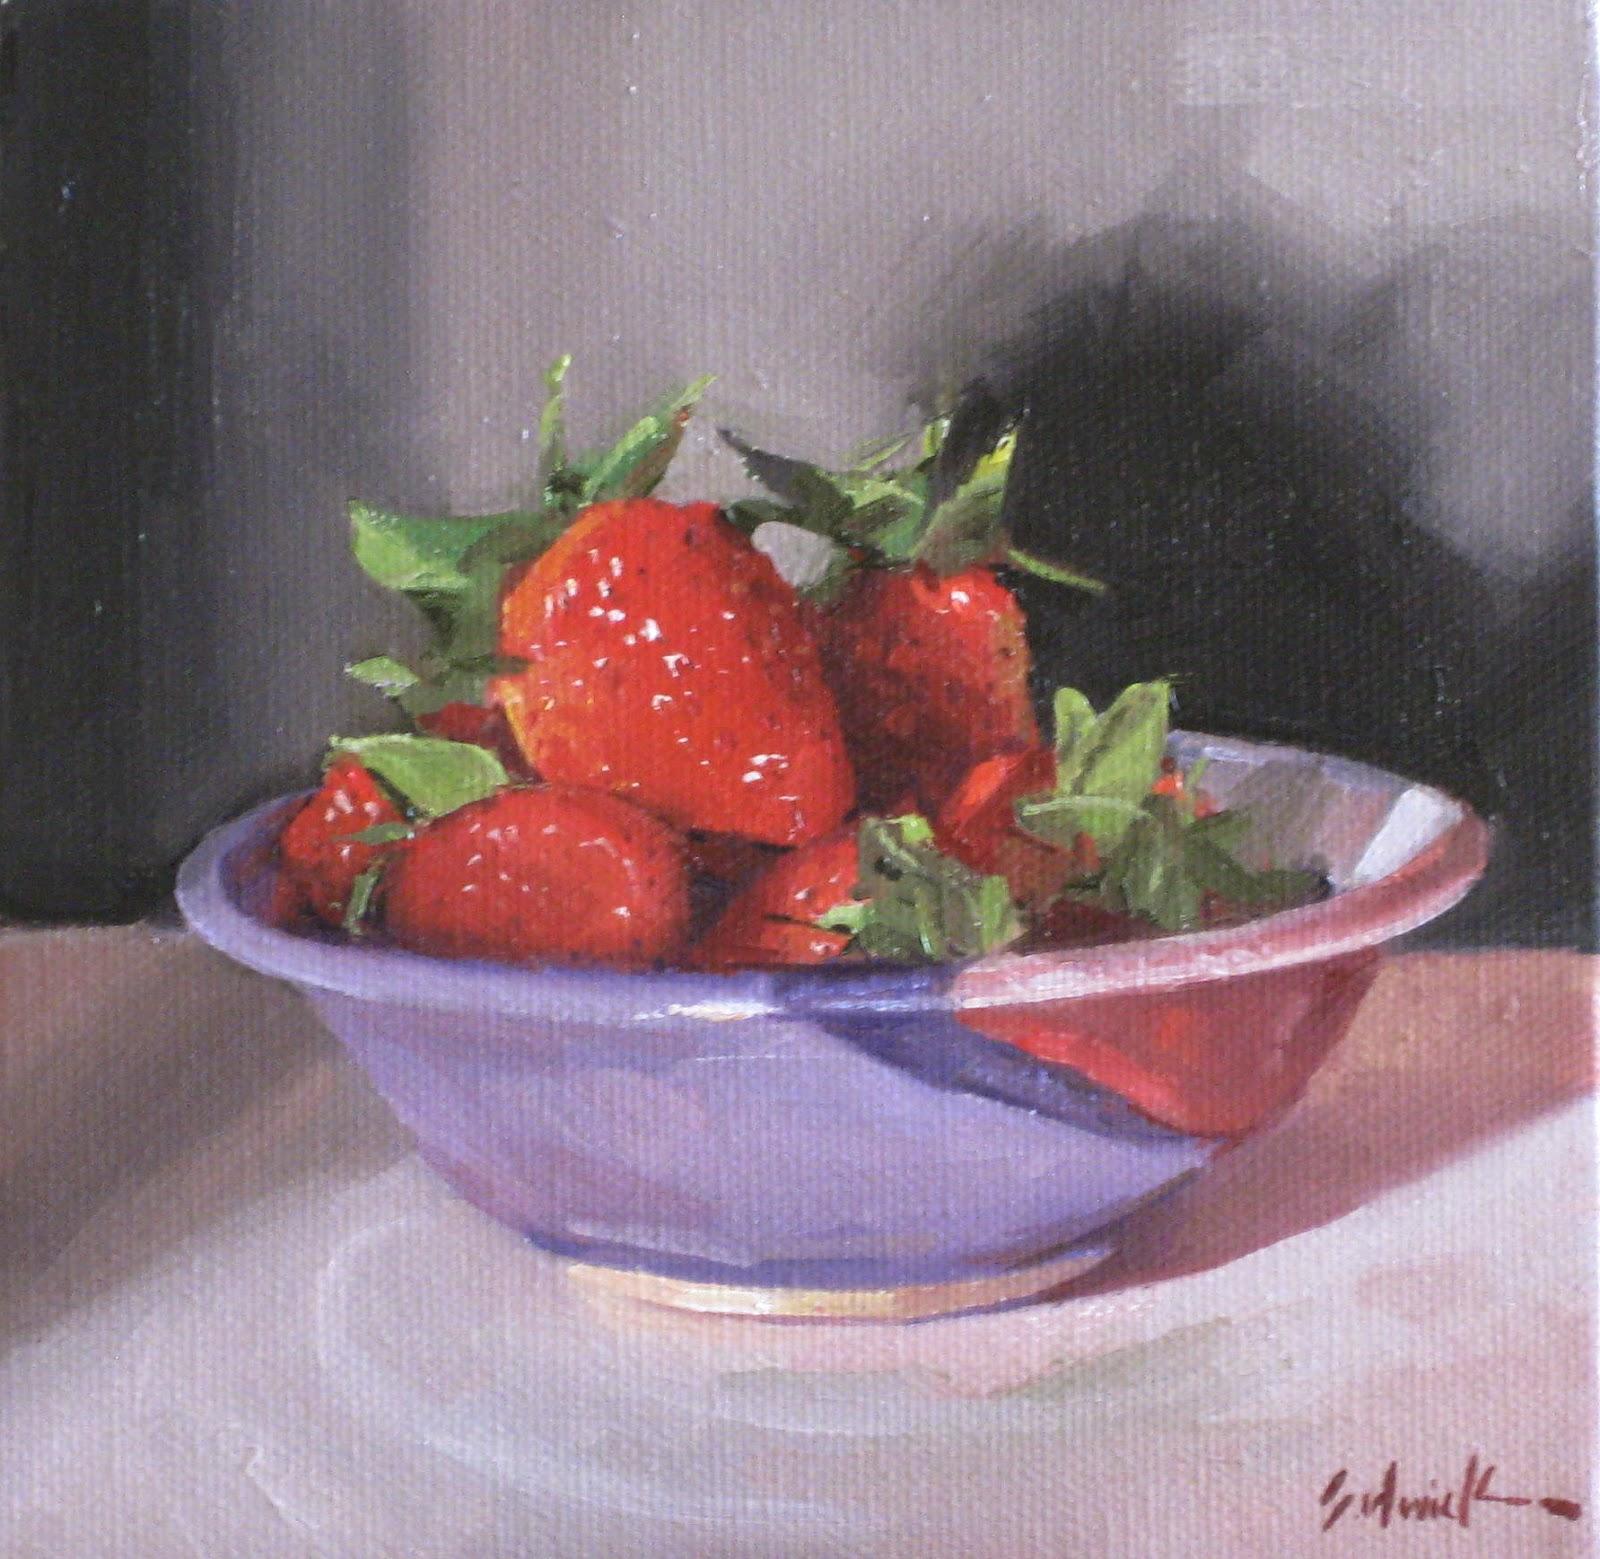 Sedwick Studio Purple Bowl Of Plums Fruit Bowl Still: Sedwick Studio: March 2012